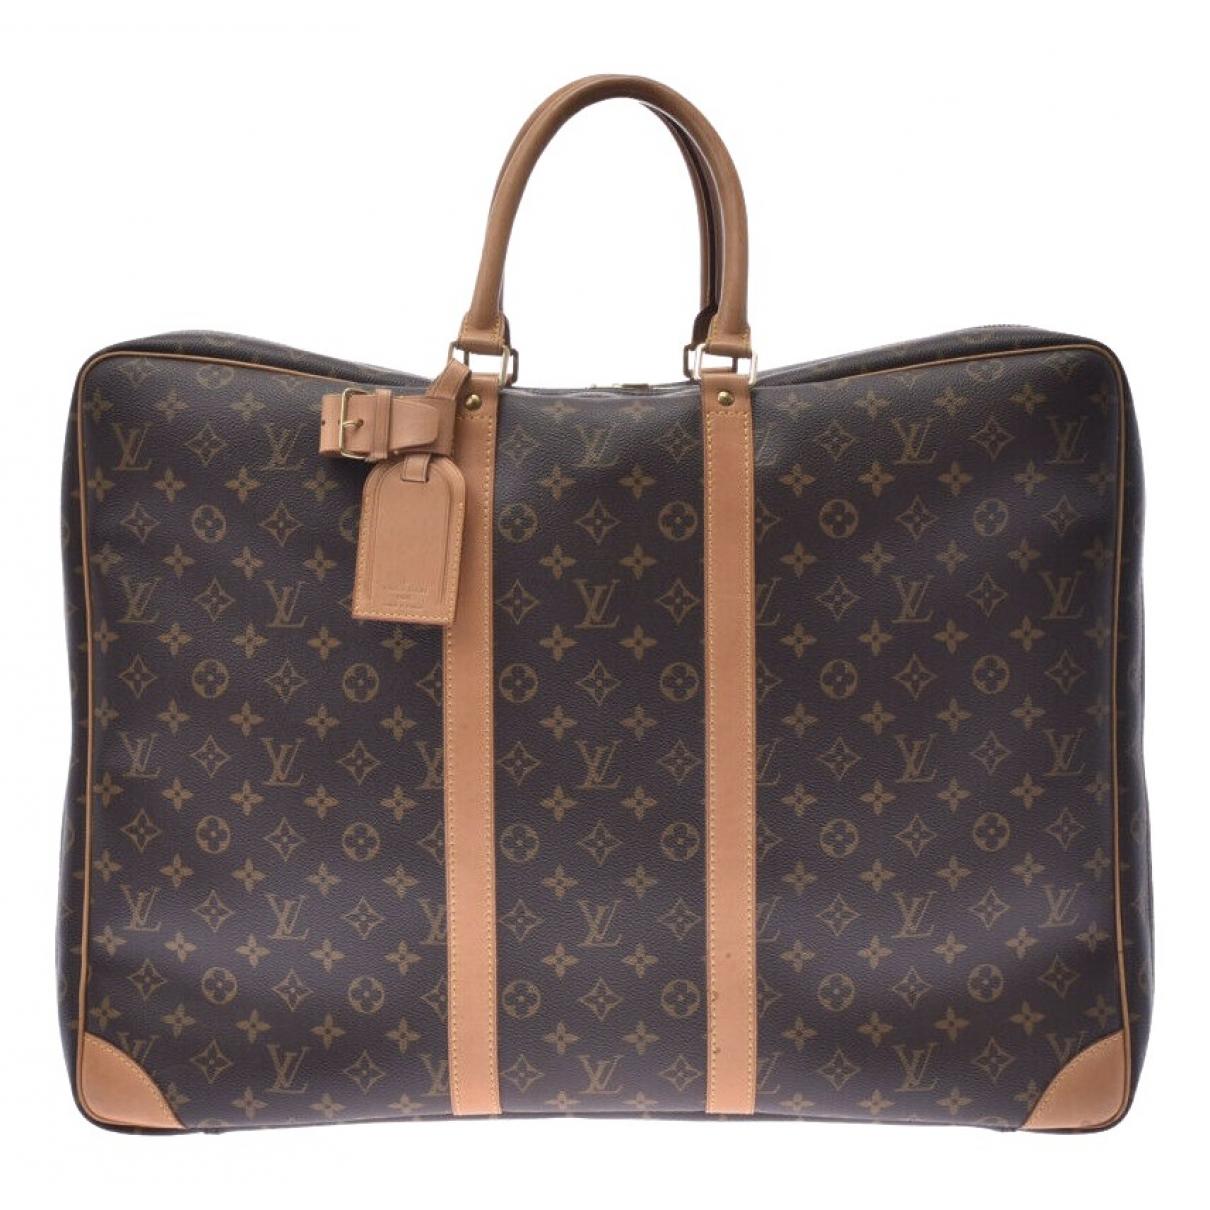 Louis Vuitton - Sac de voyage Sirius  pour femme en toile - marron